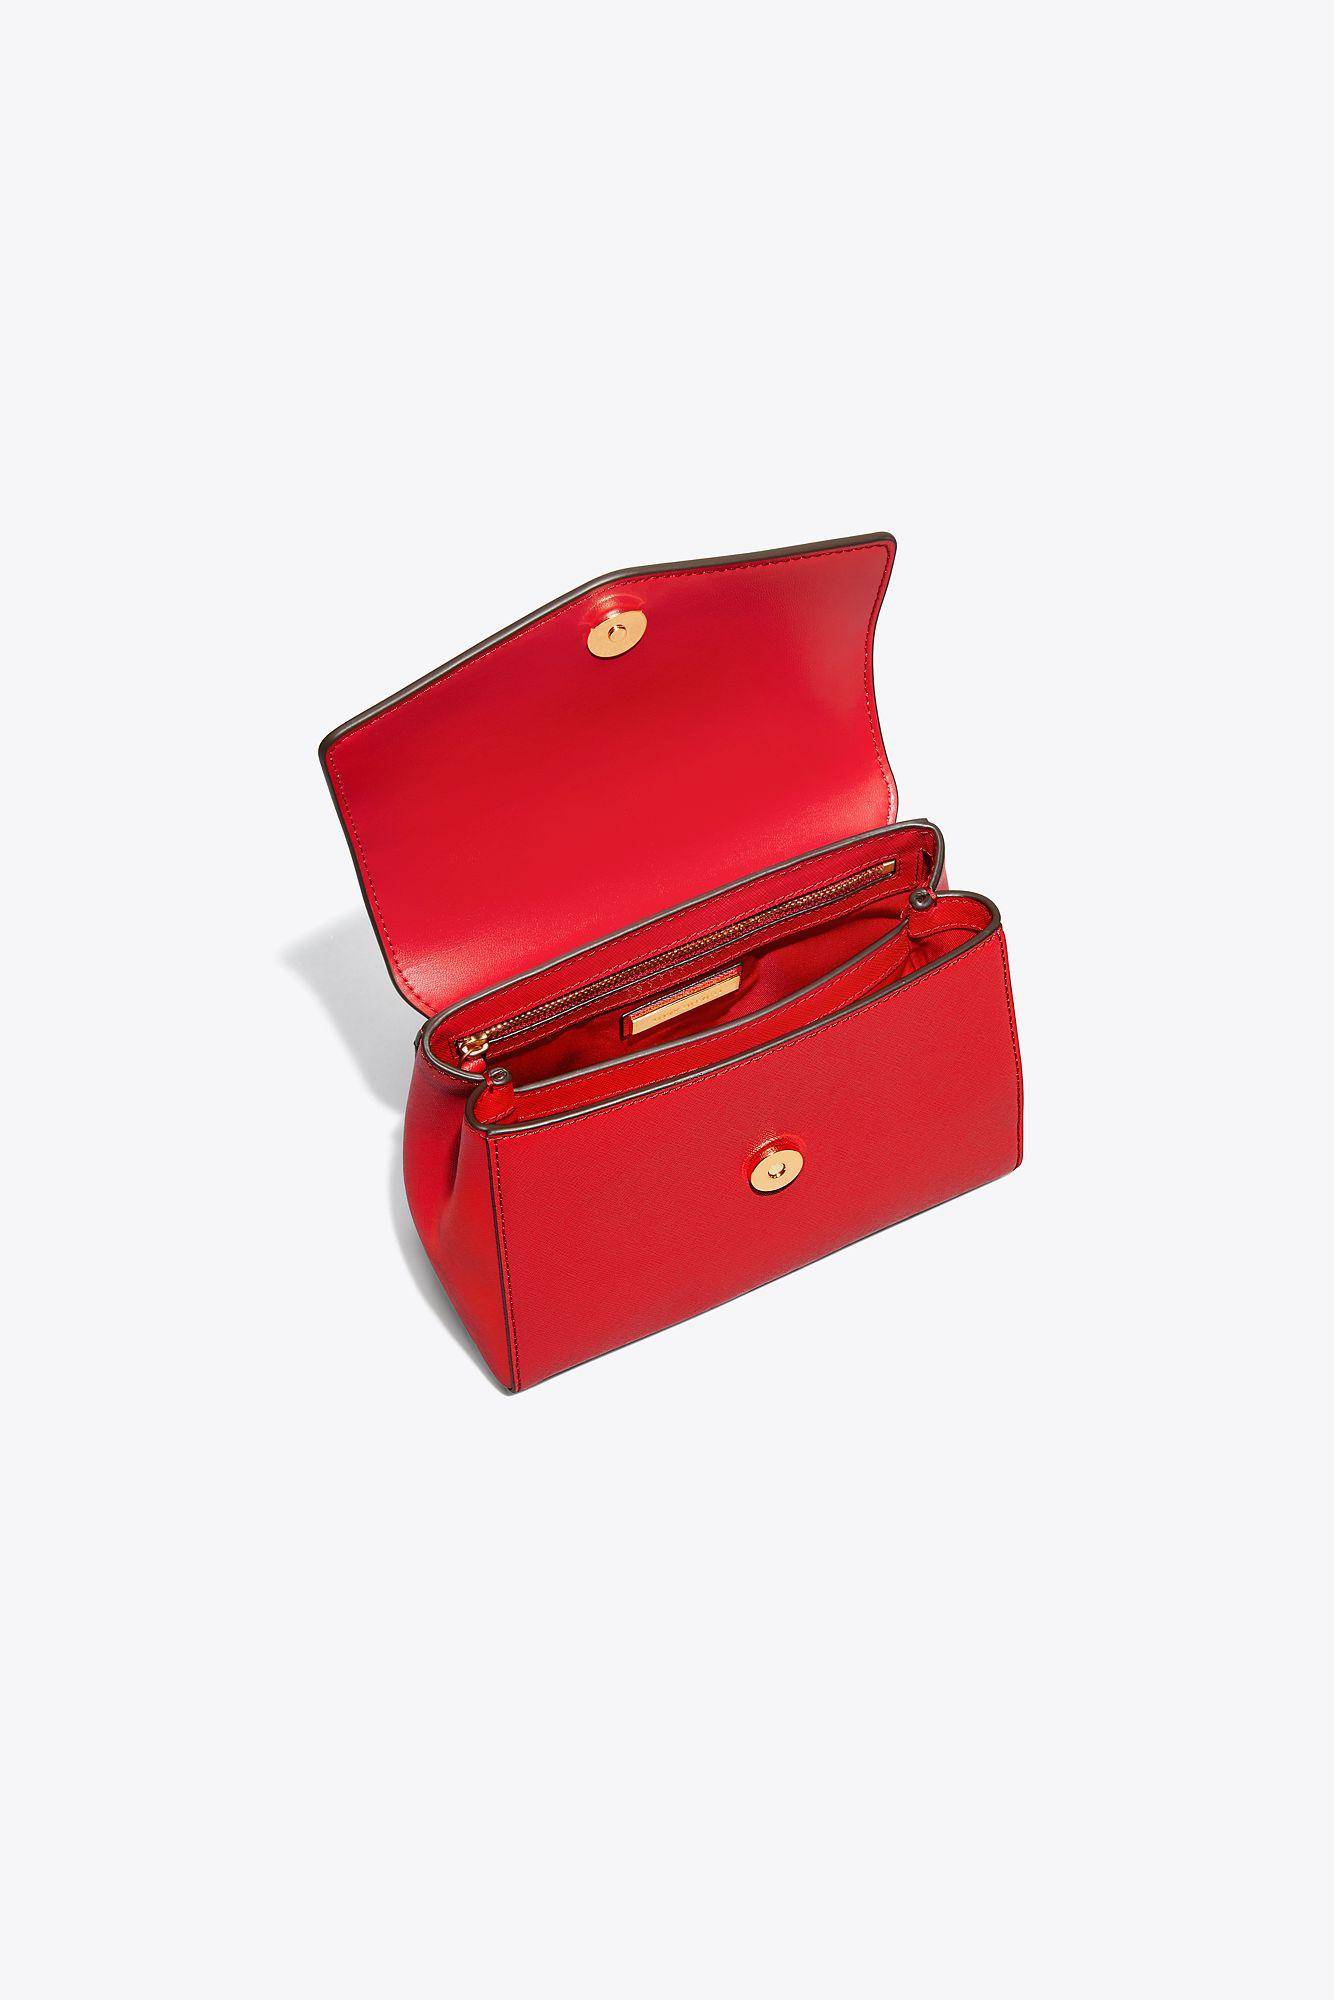 dfcb2a28af0a Tory Burch - Red Robinson Small Top-handle Satchel - Lyst. View fullscreen